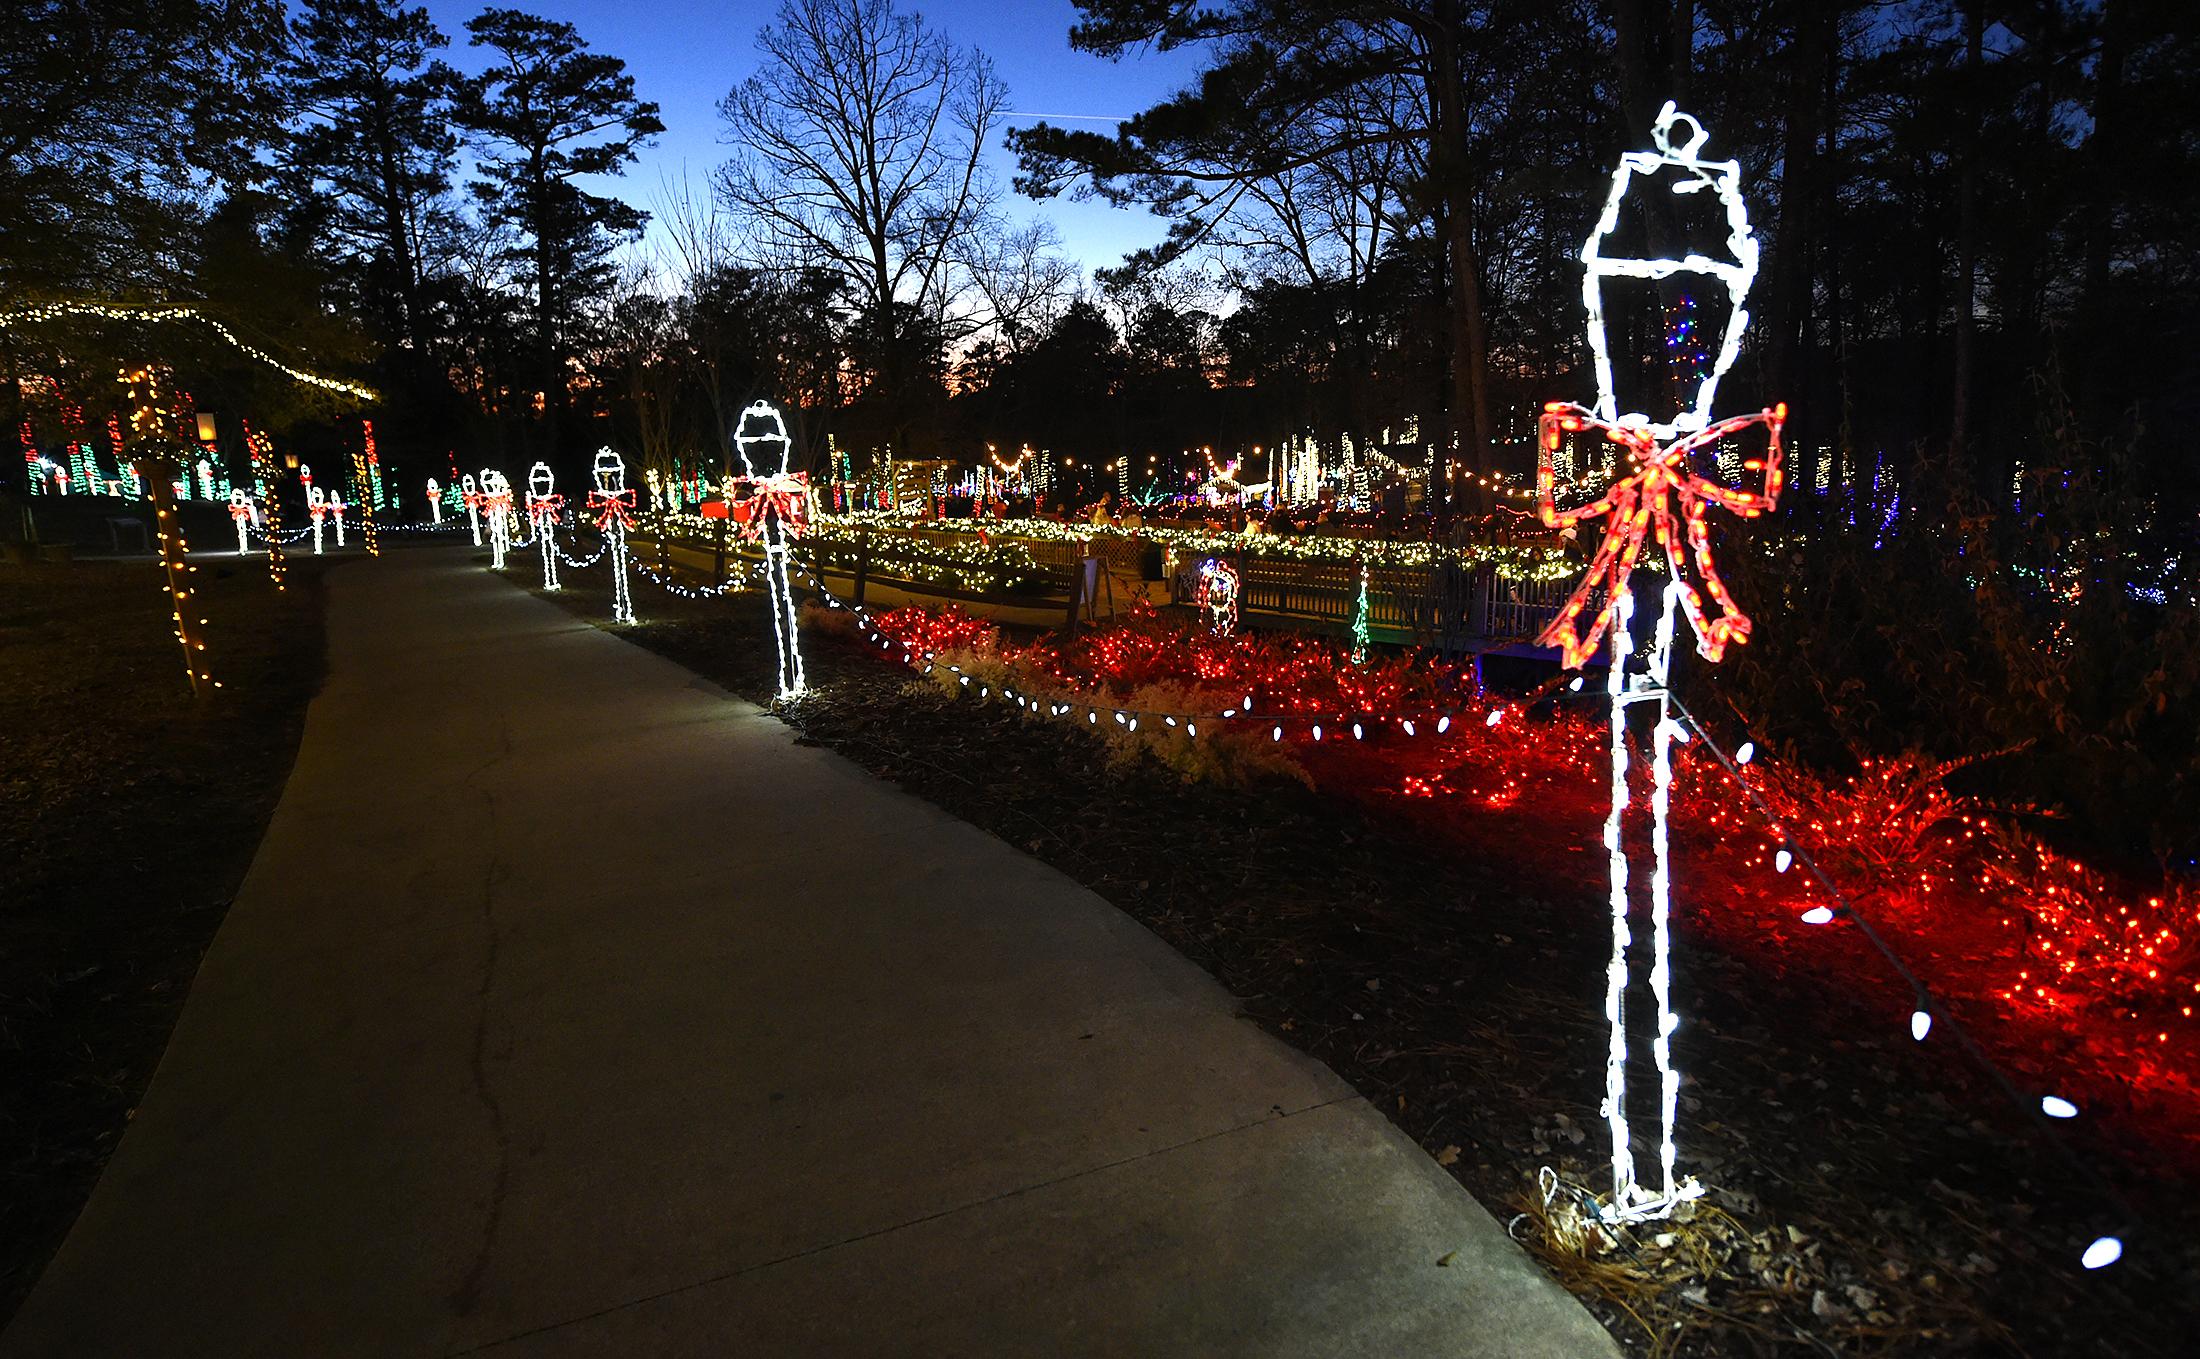 Rolla Christmas Lights Dec 2021 Check Out These Joyous Christmas Lights Across Alabama Al Com